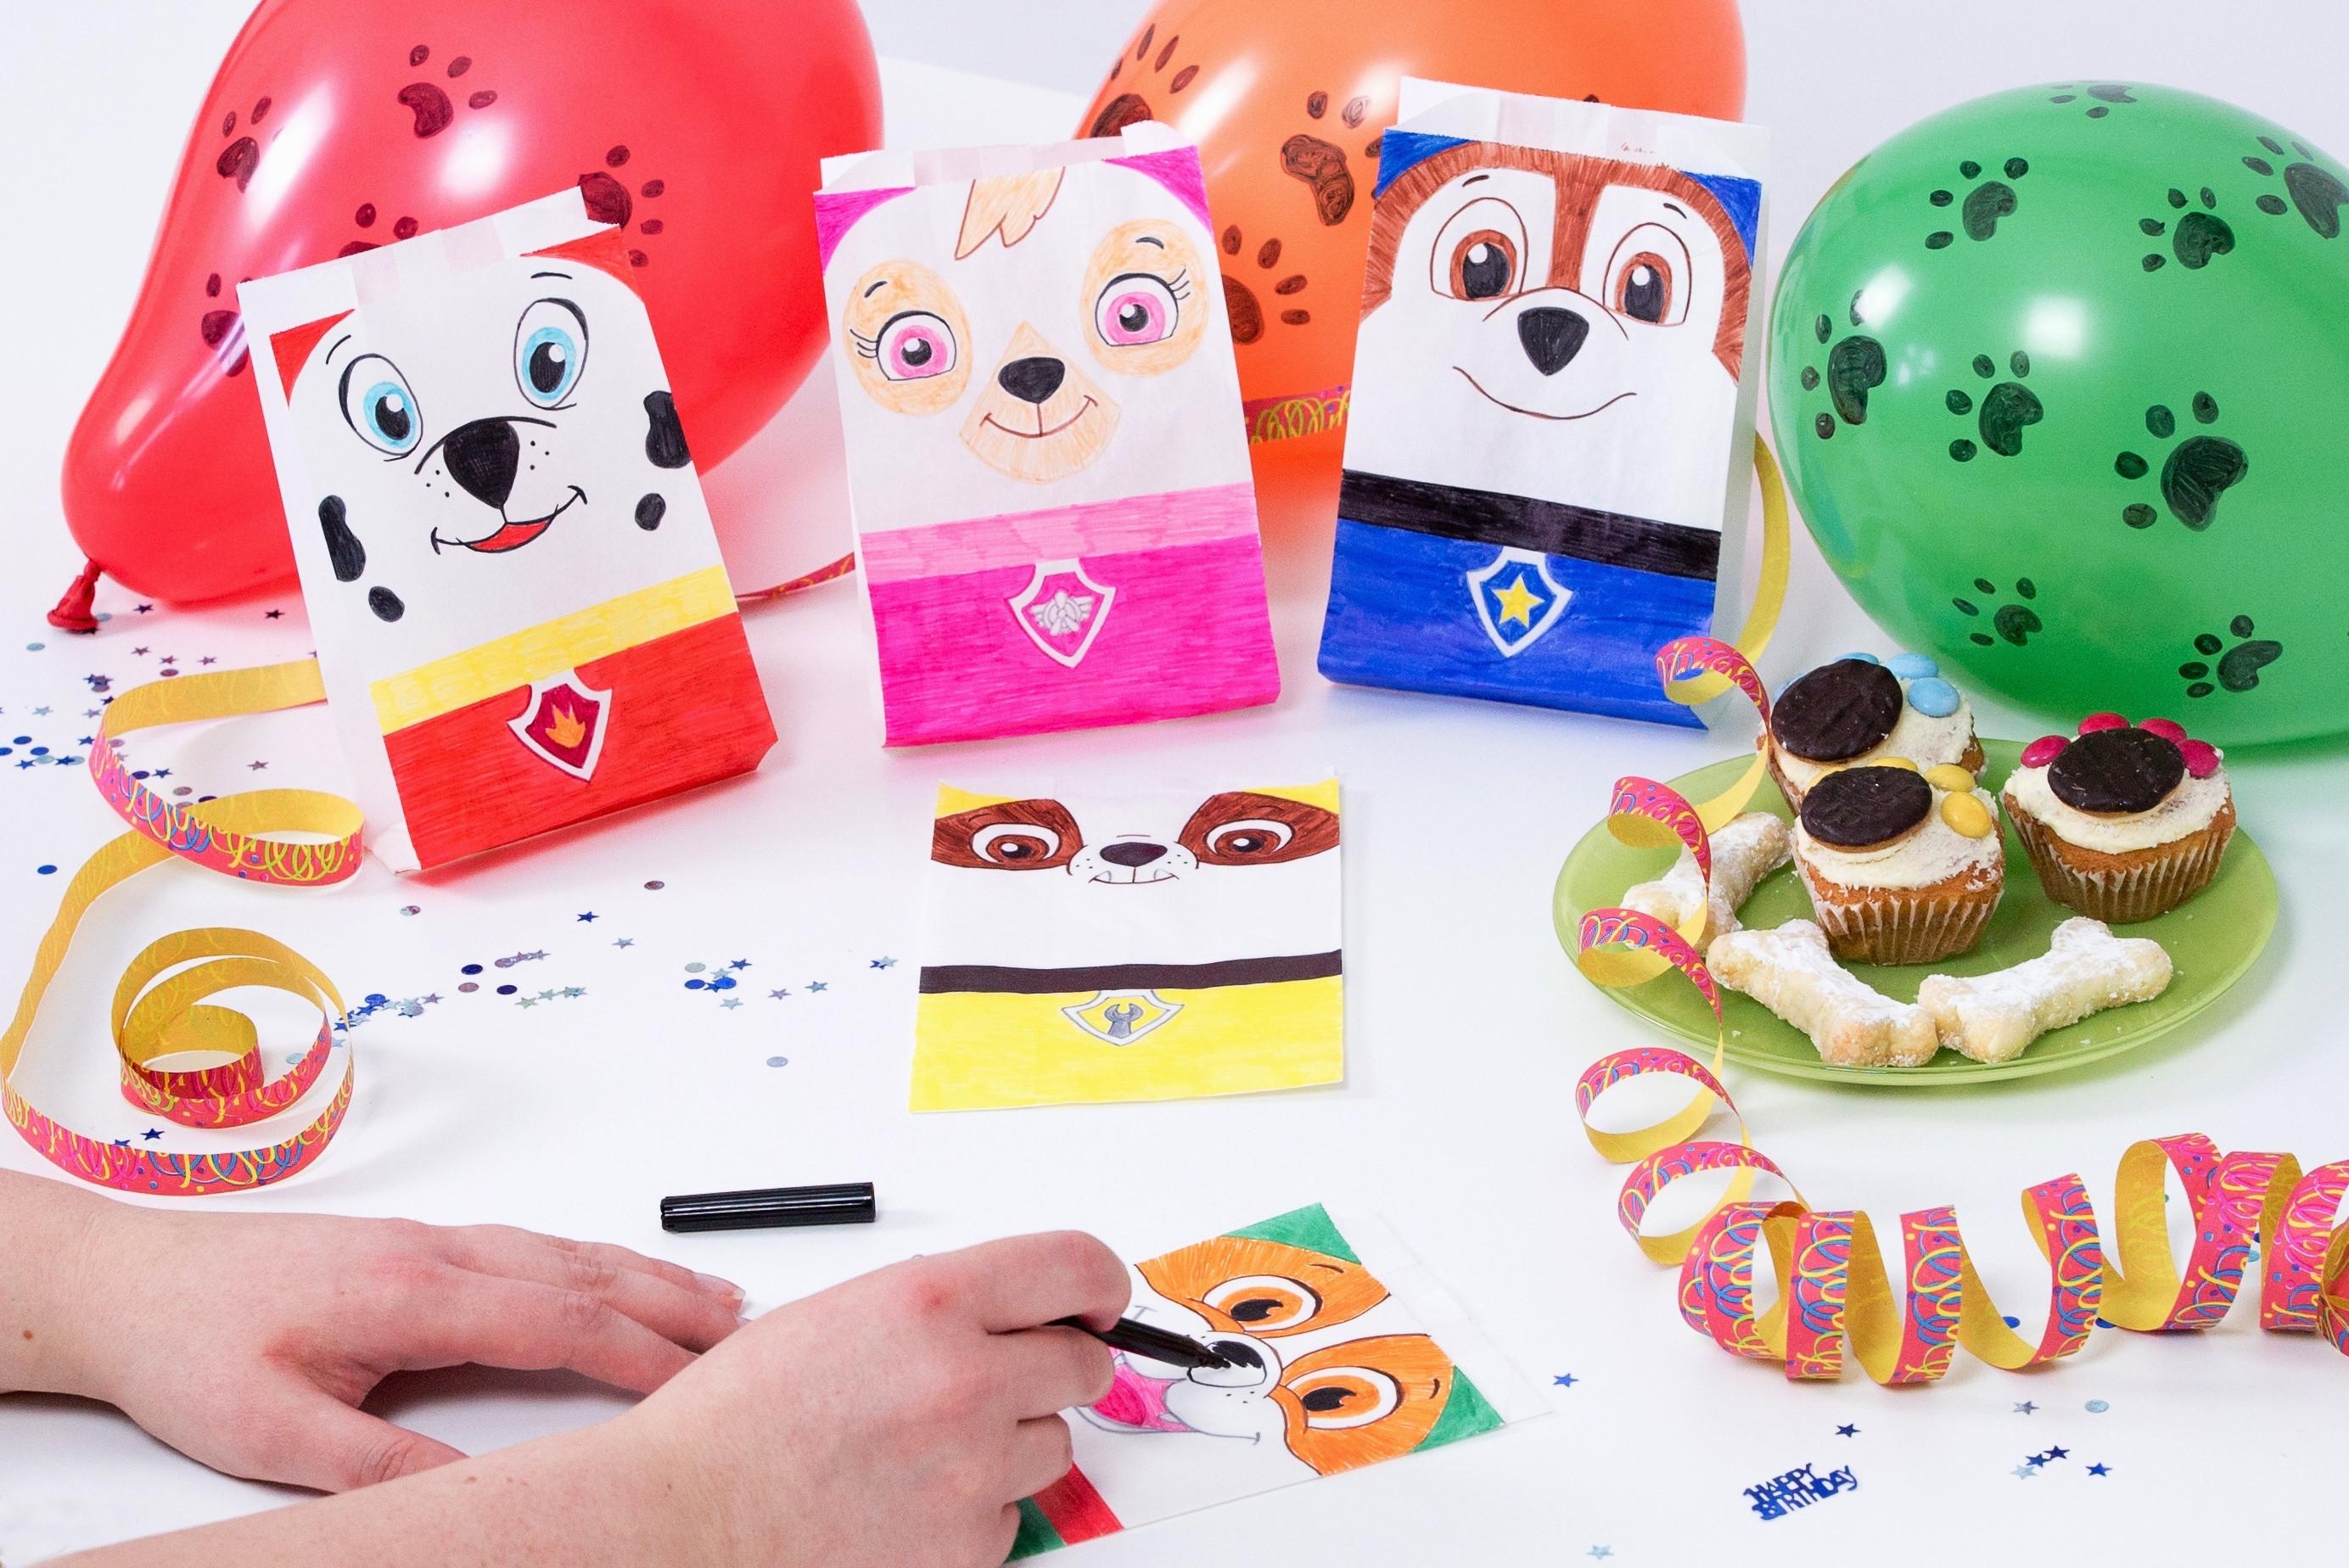 Paw Patrol Geburtstagsparty  PAW Patrol Kindergeburtstag – lustige Snack und Spiele Ideen